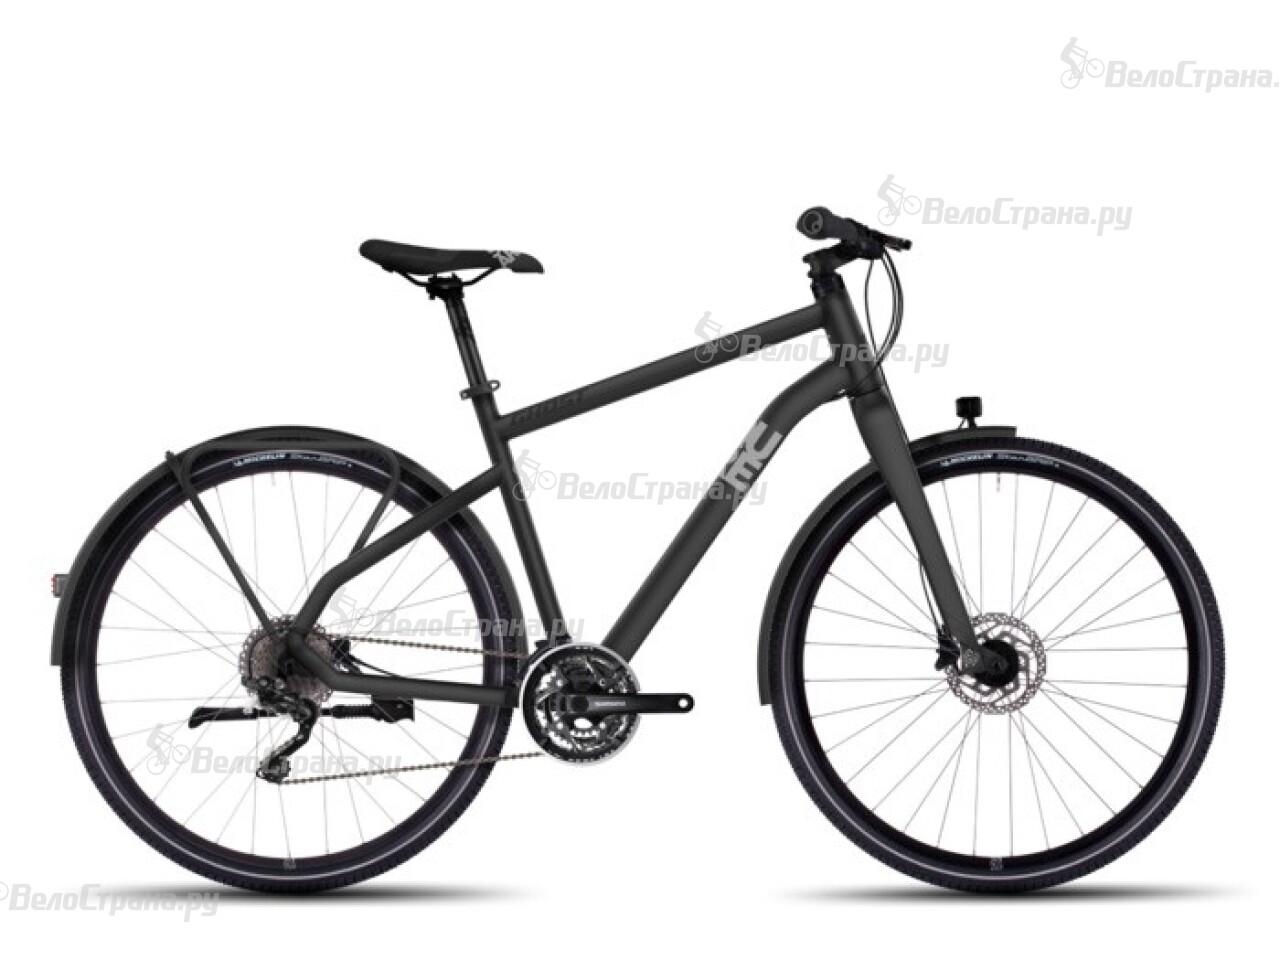 Велосипед Ghost SQUARE Urban X 8 (2016) цены онлайн